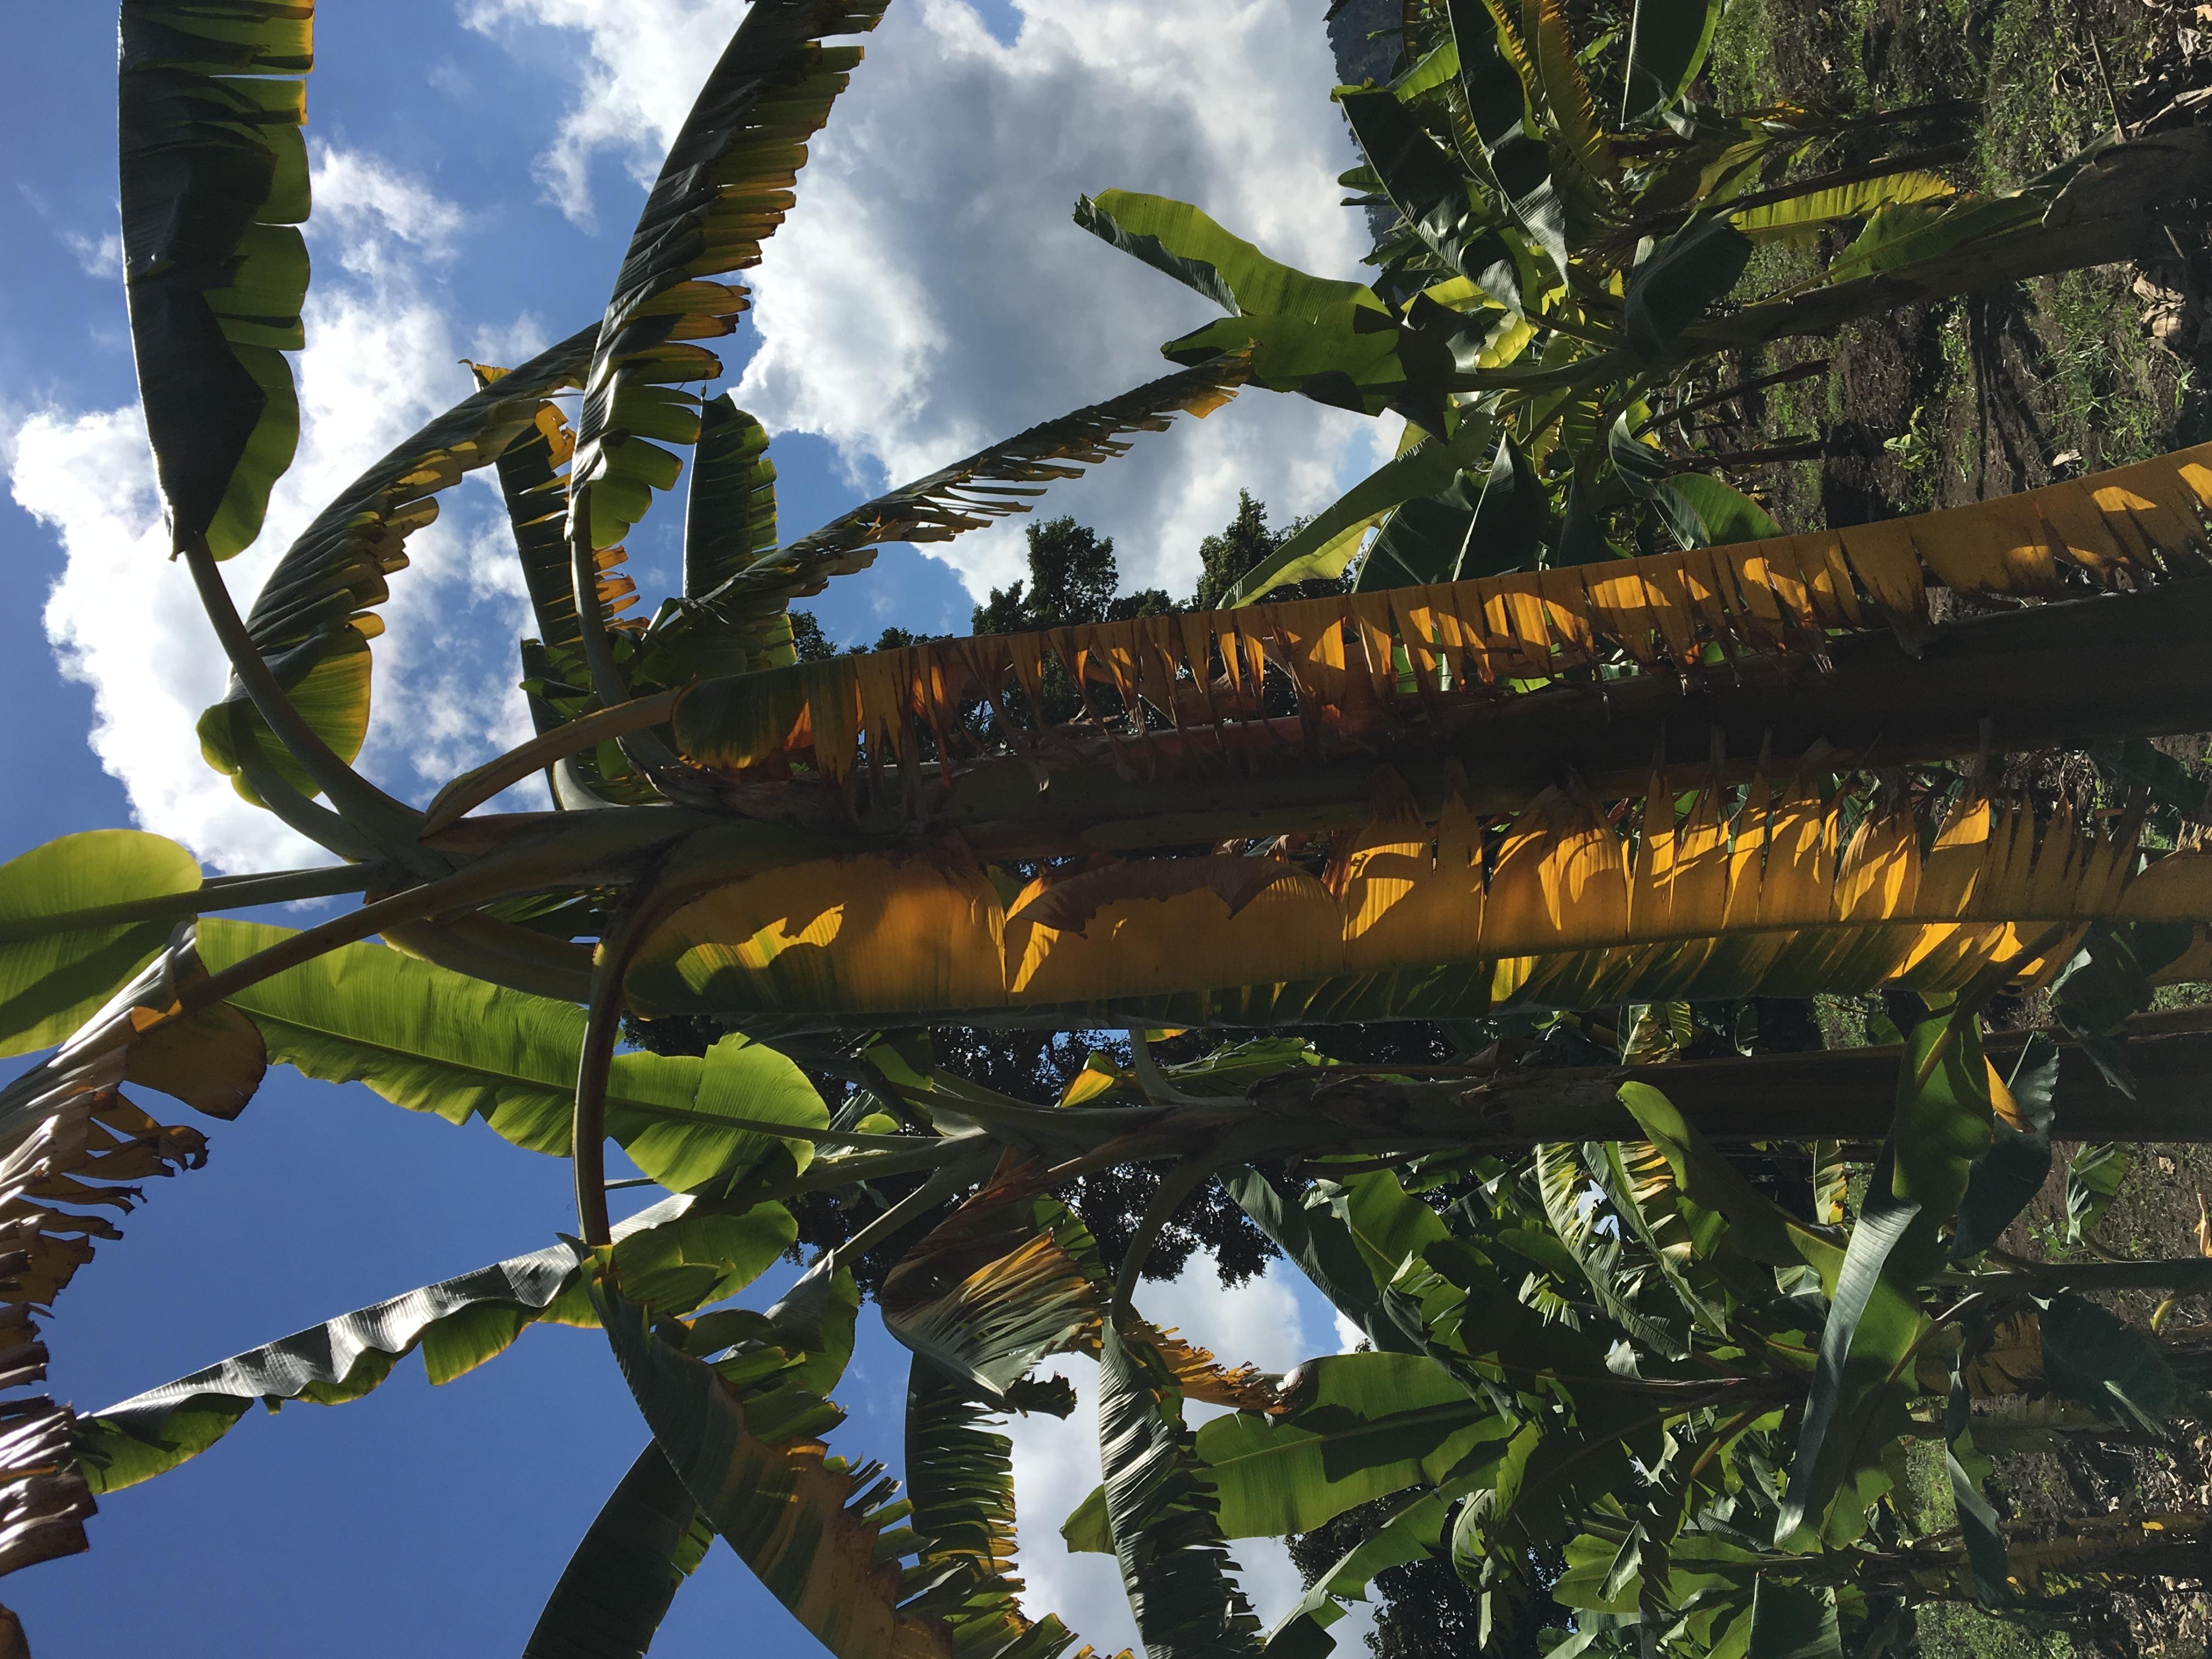 Banana | Diseases and Pests, Description, Uses, Propagation